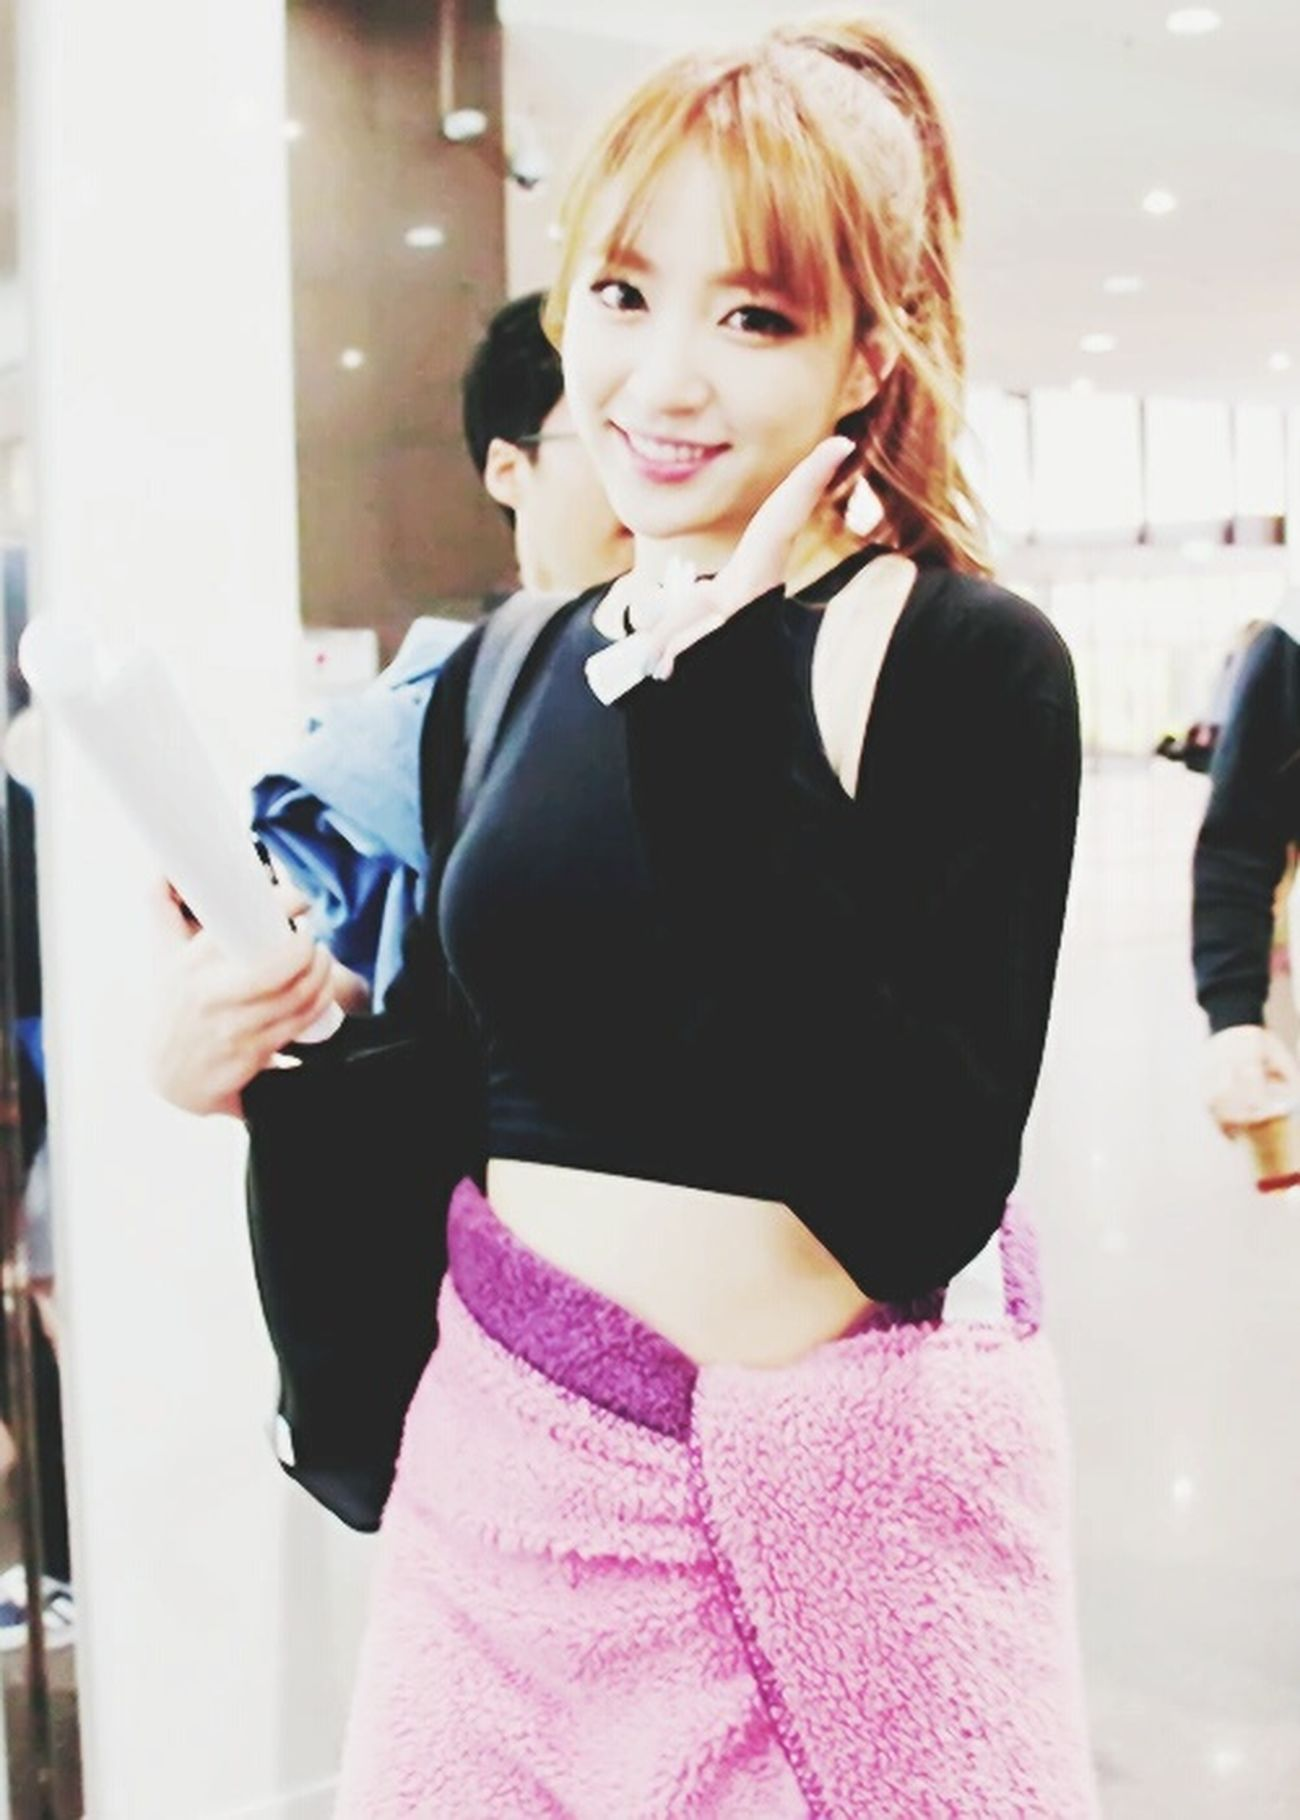 Hani EXID Up And Down Ah Yeah Girl Girls Pretty Gorgeous Korean Kpop